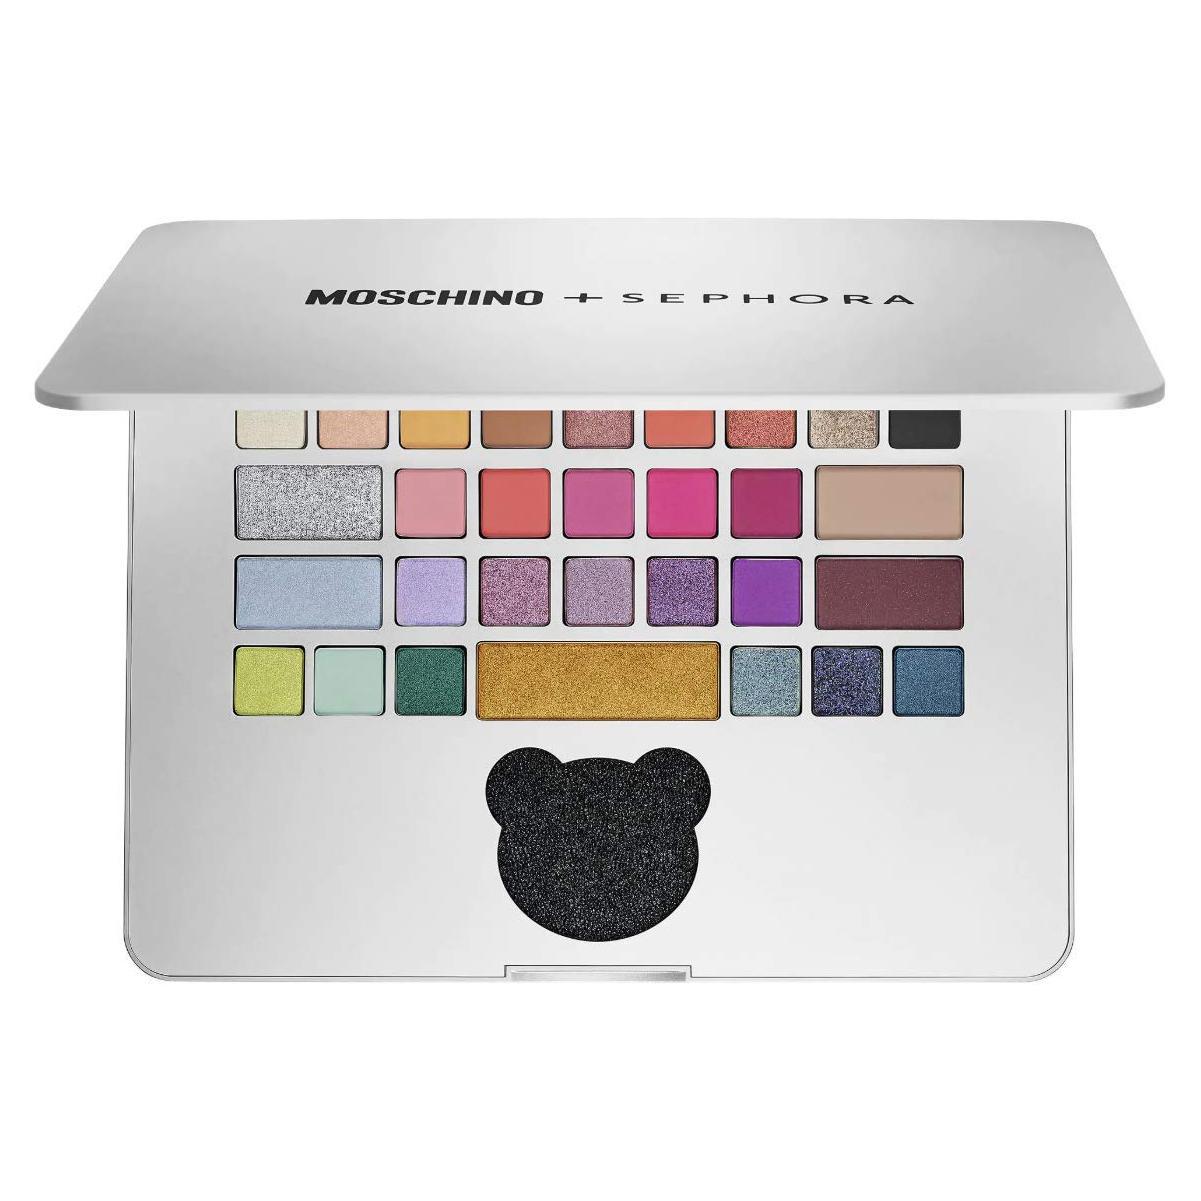 Sephora + Moschino Laptop Palette